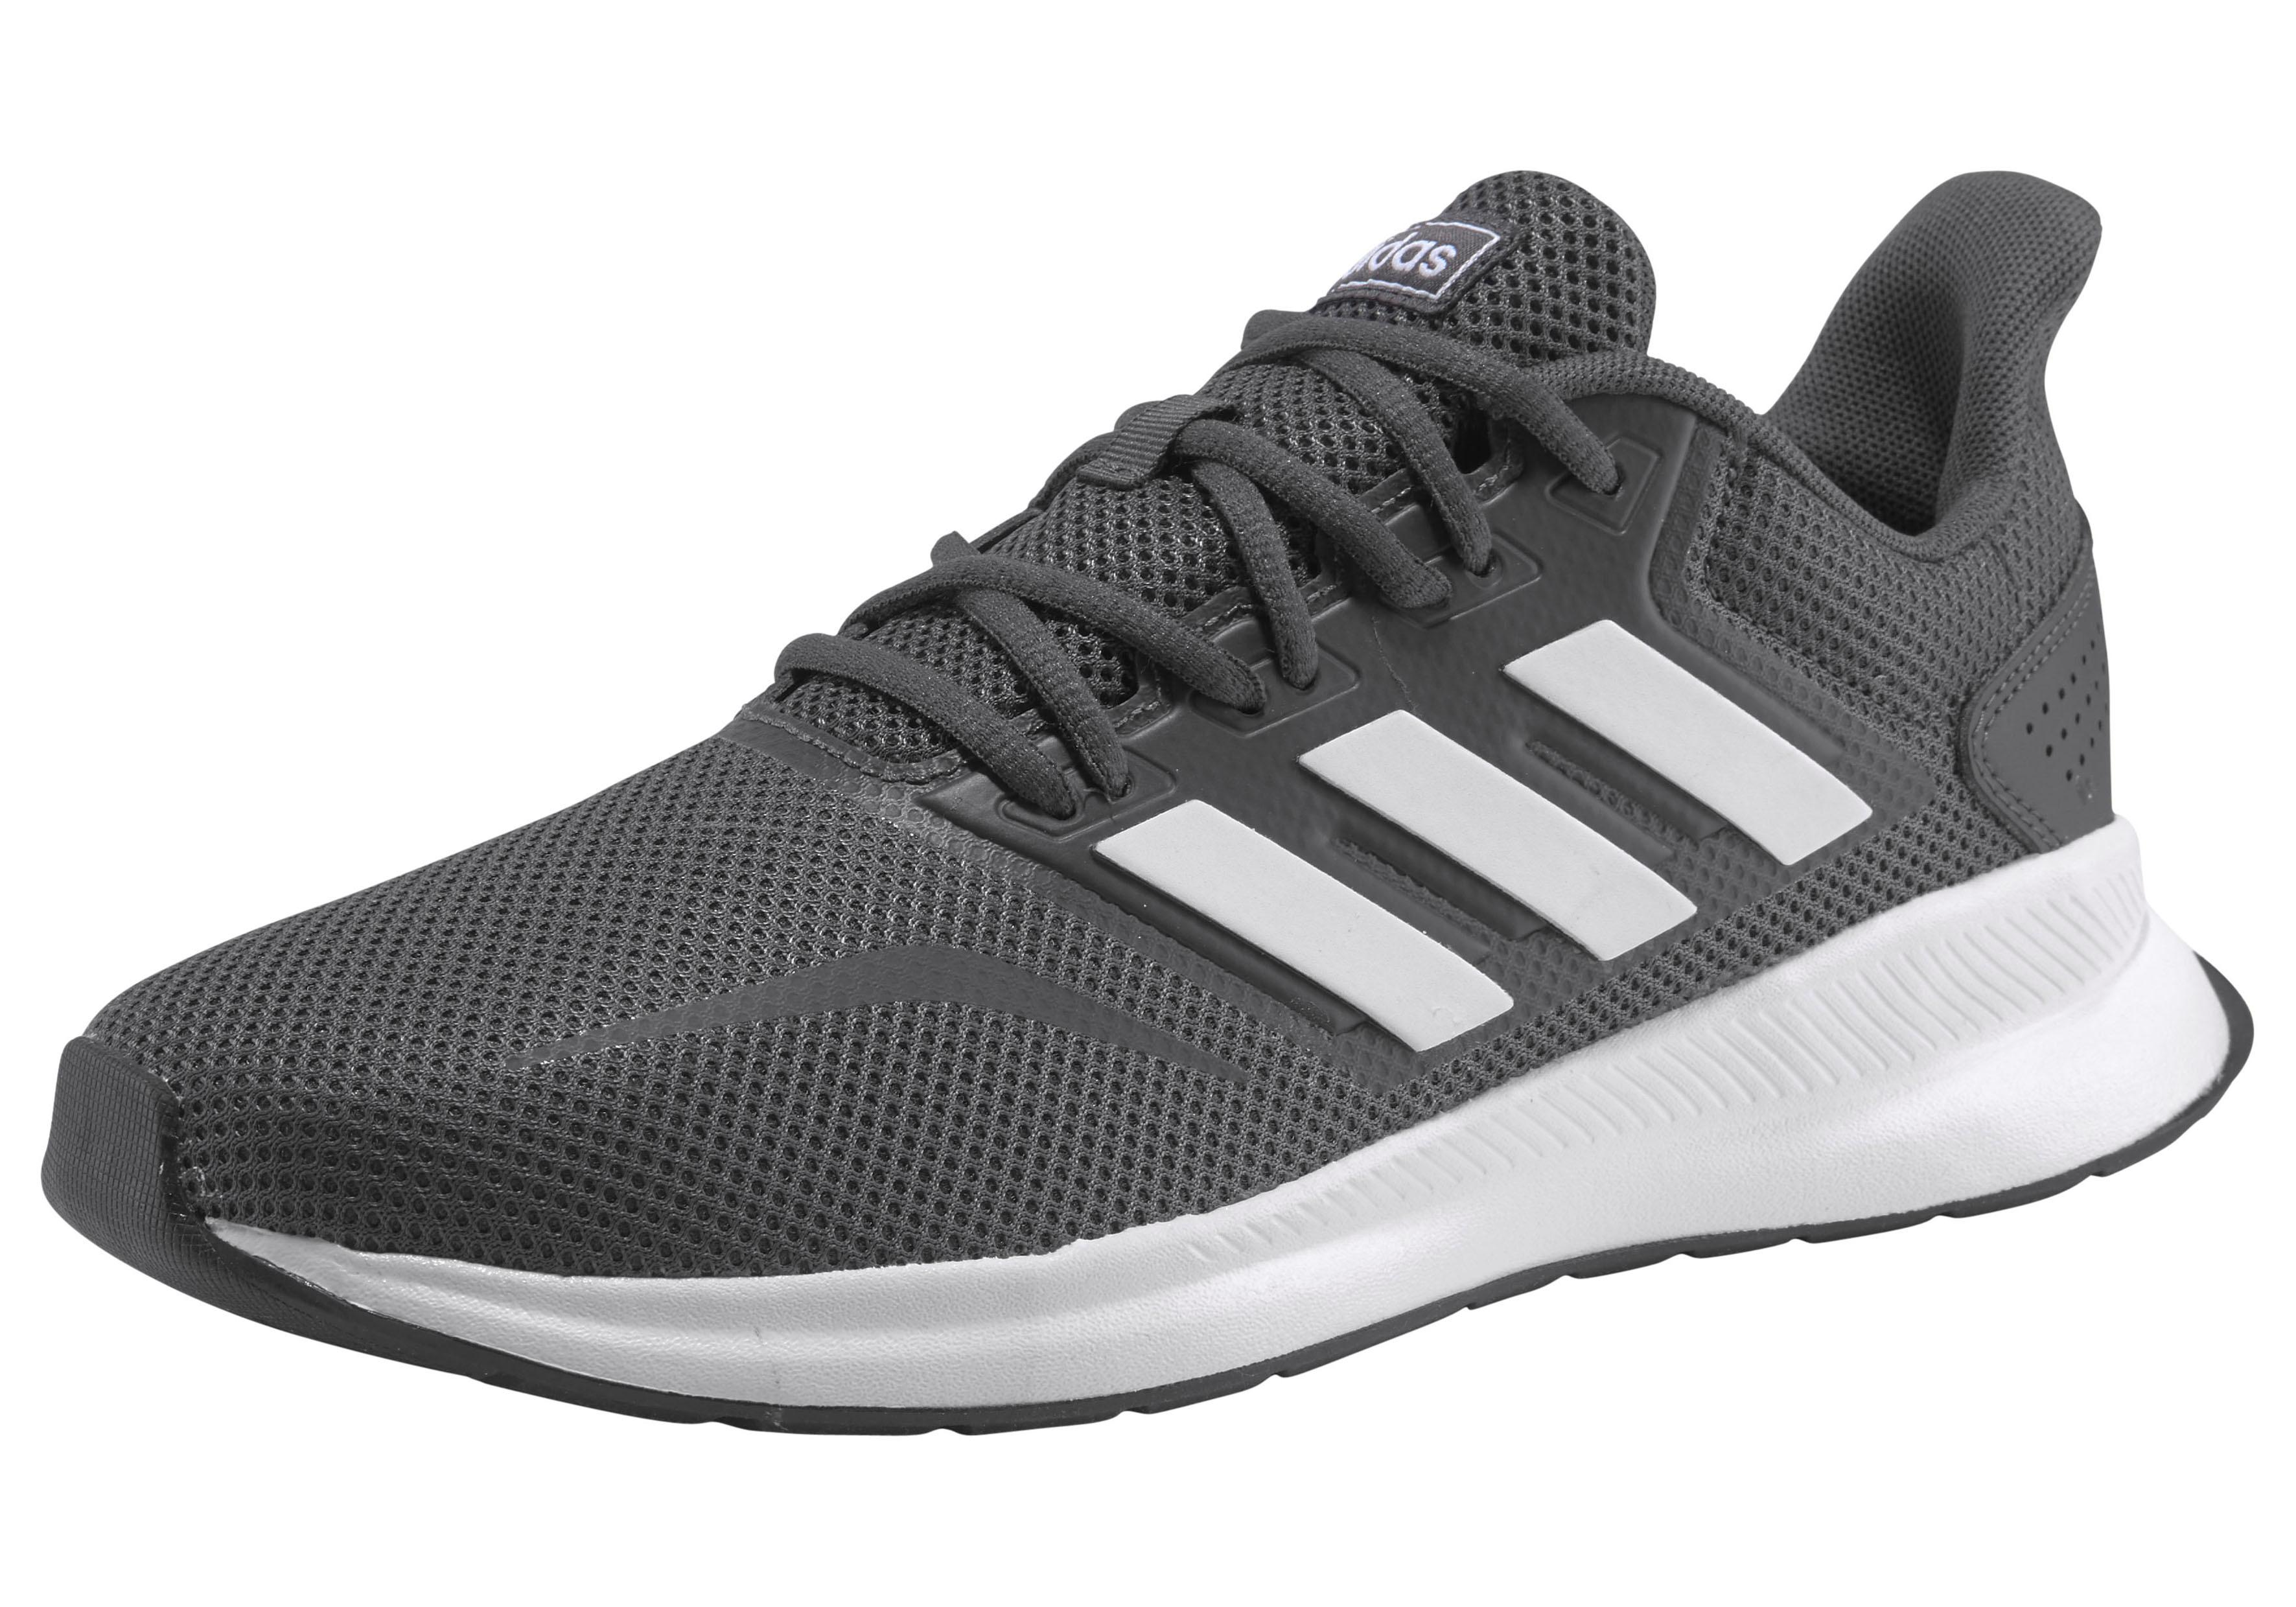 adidas Laufschuh Falcon | Schuhe > Sportschuhe > Laufschuhe | Adidas